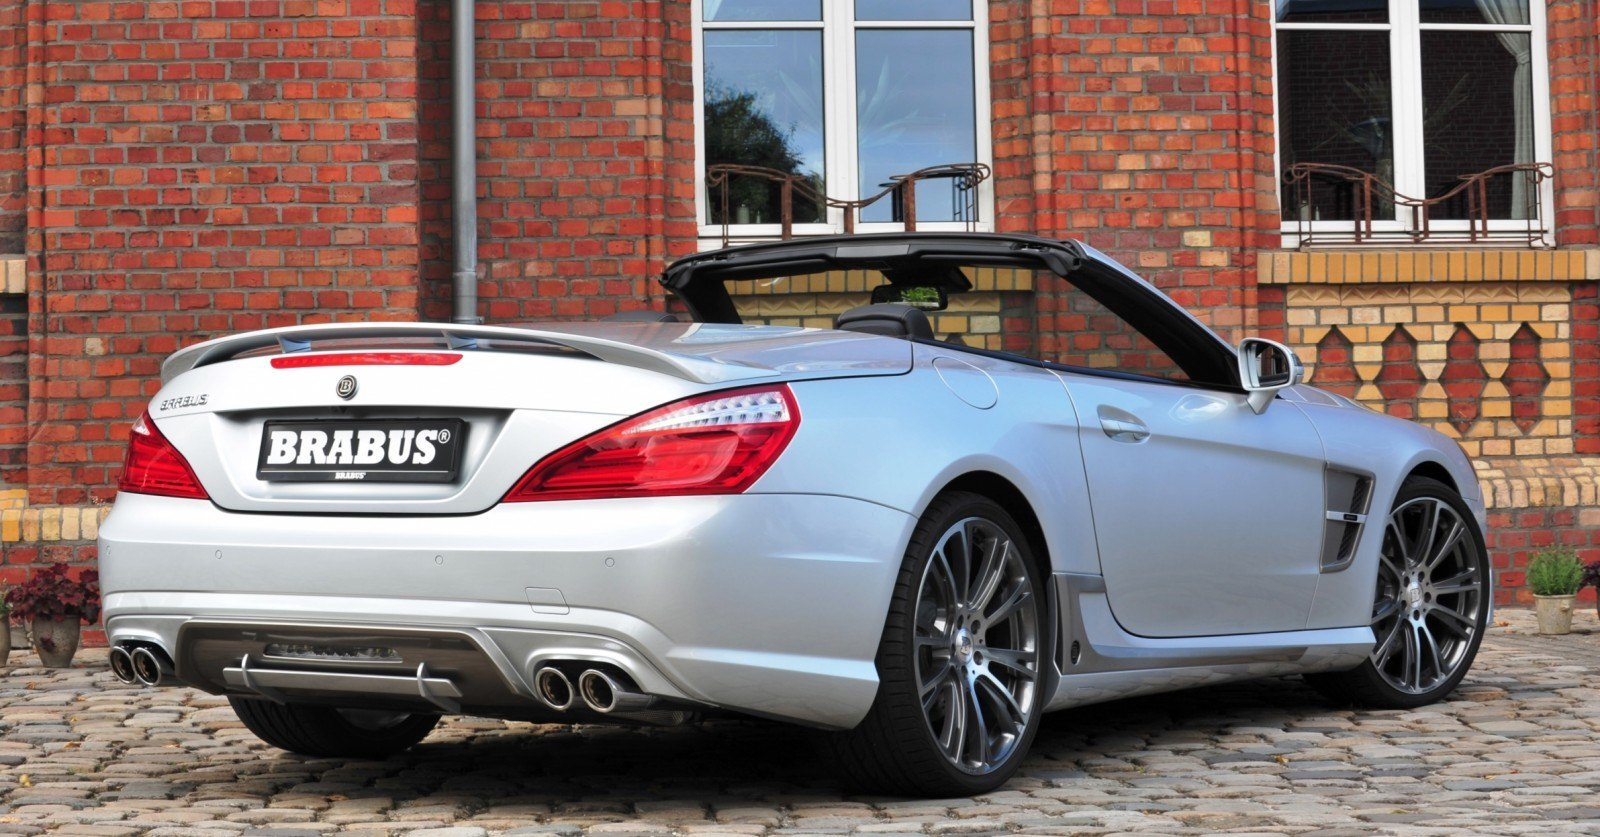 BRABUS Mercedes-Benz SL550 R231 2